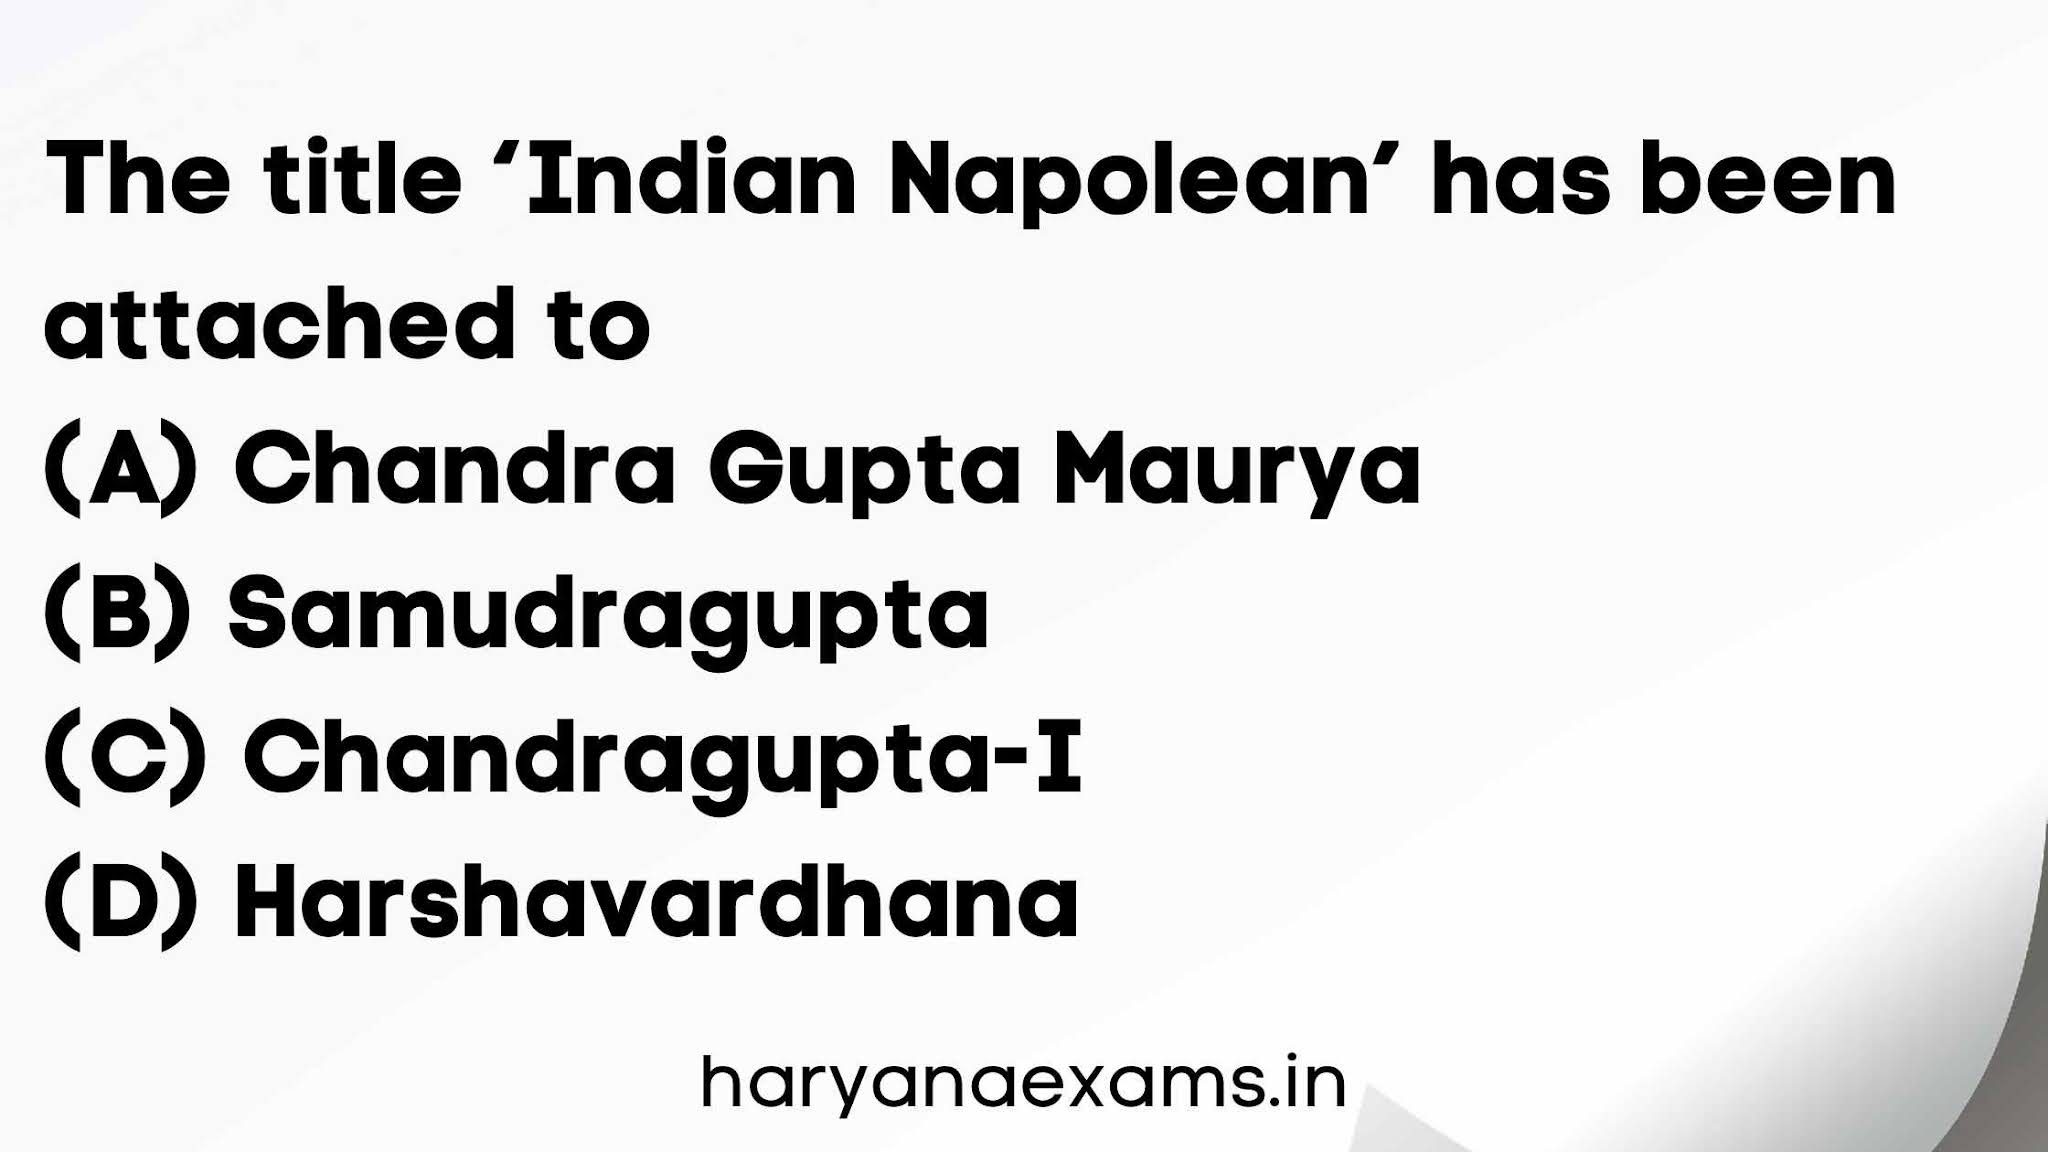 The title 'Indian Napolean' has been attached to   (A) Chandra Gupta Maurya   (B) Samudragupta   (C) Chandragupta-I   (D) Harshavardhana